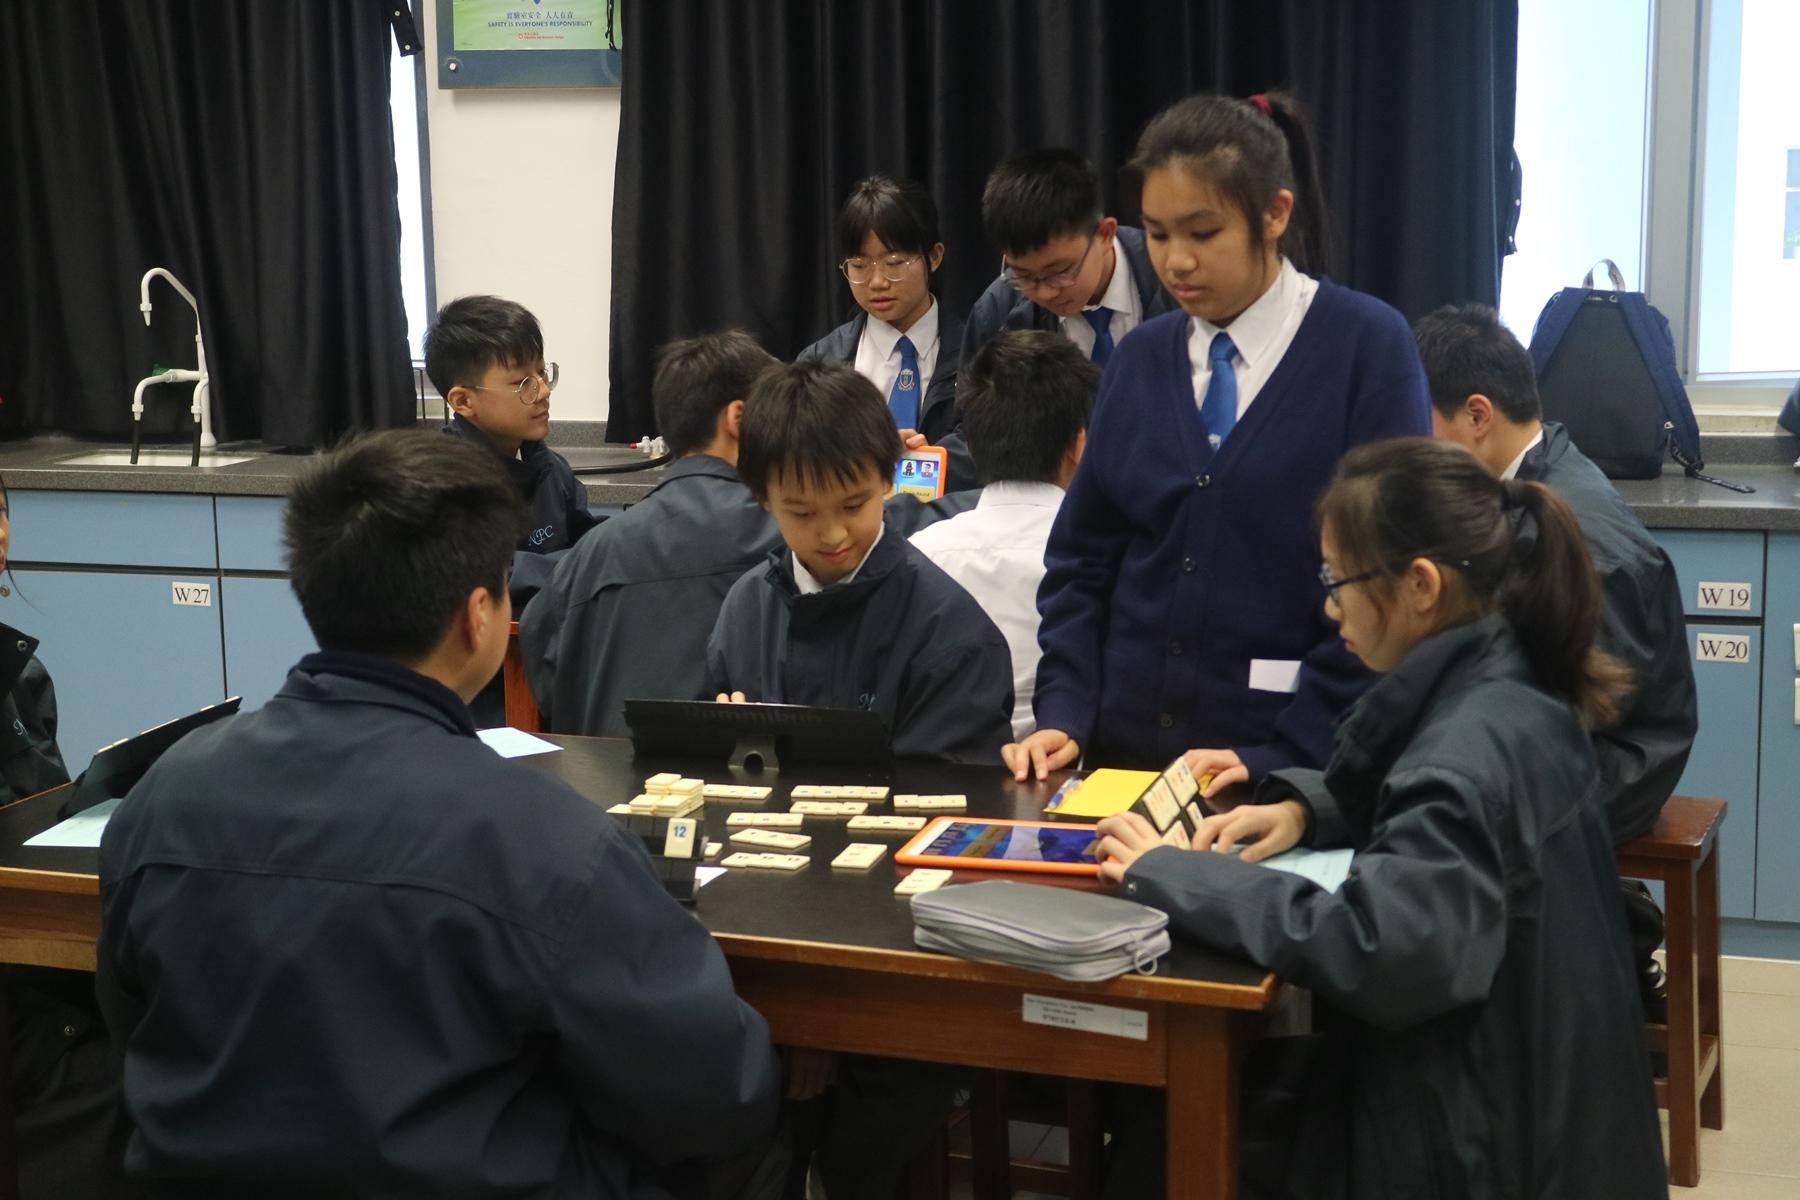 http://npc.edu.hk/sites/default/files/img_8849.jpg